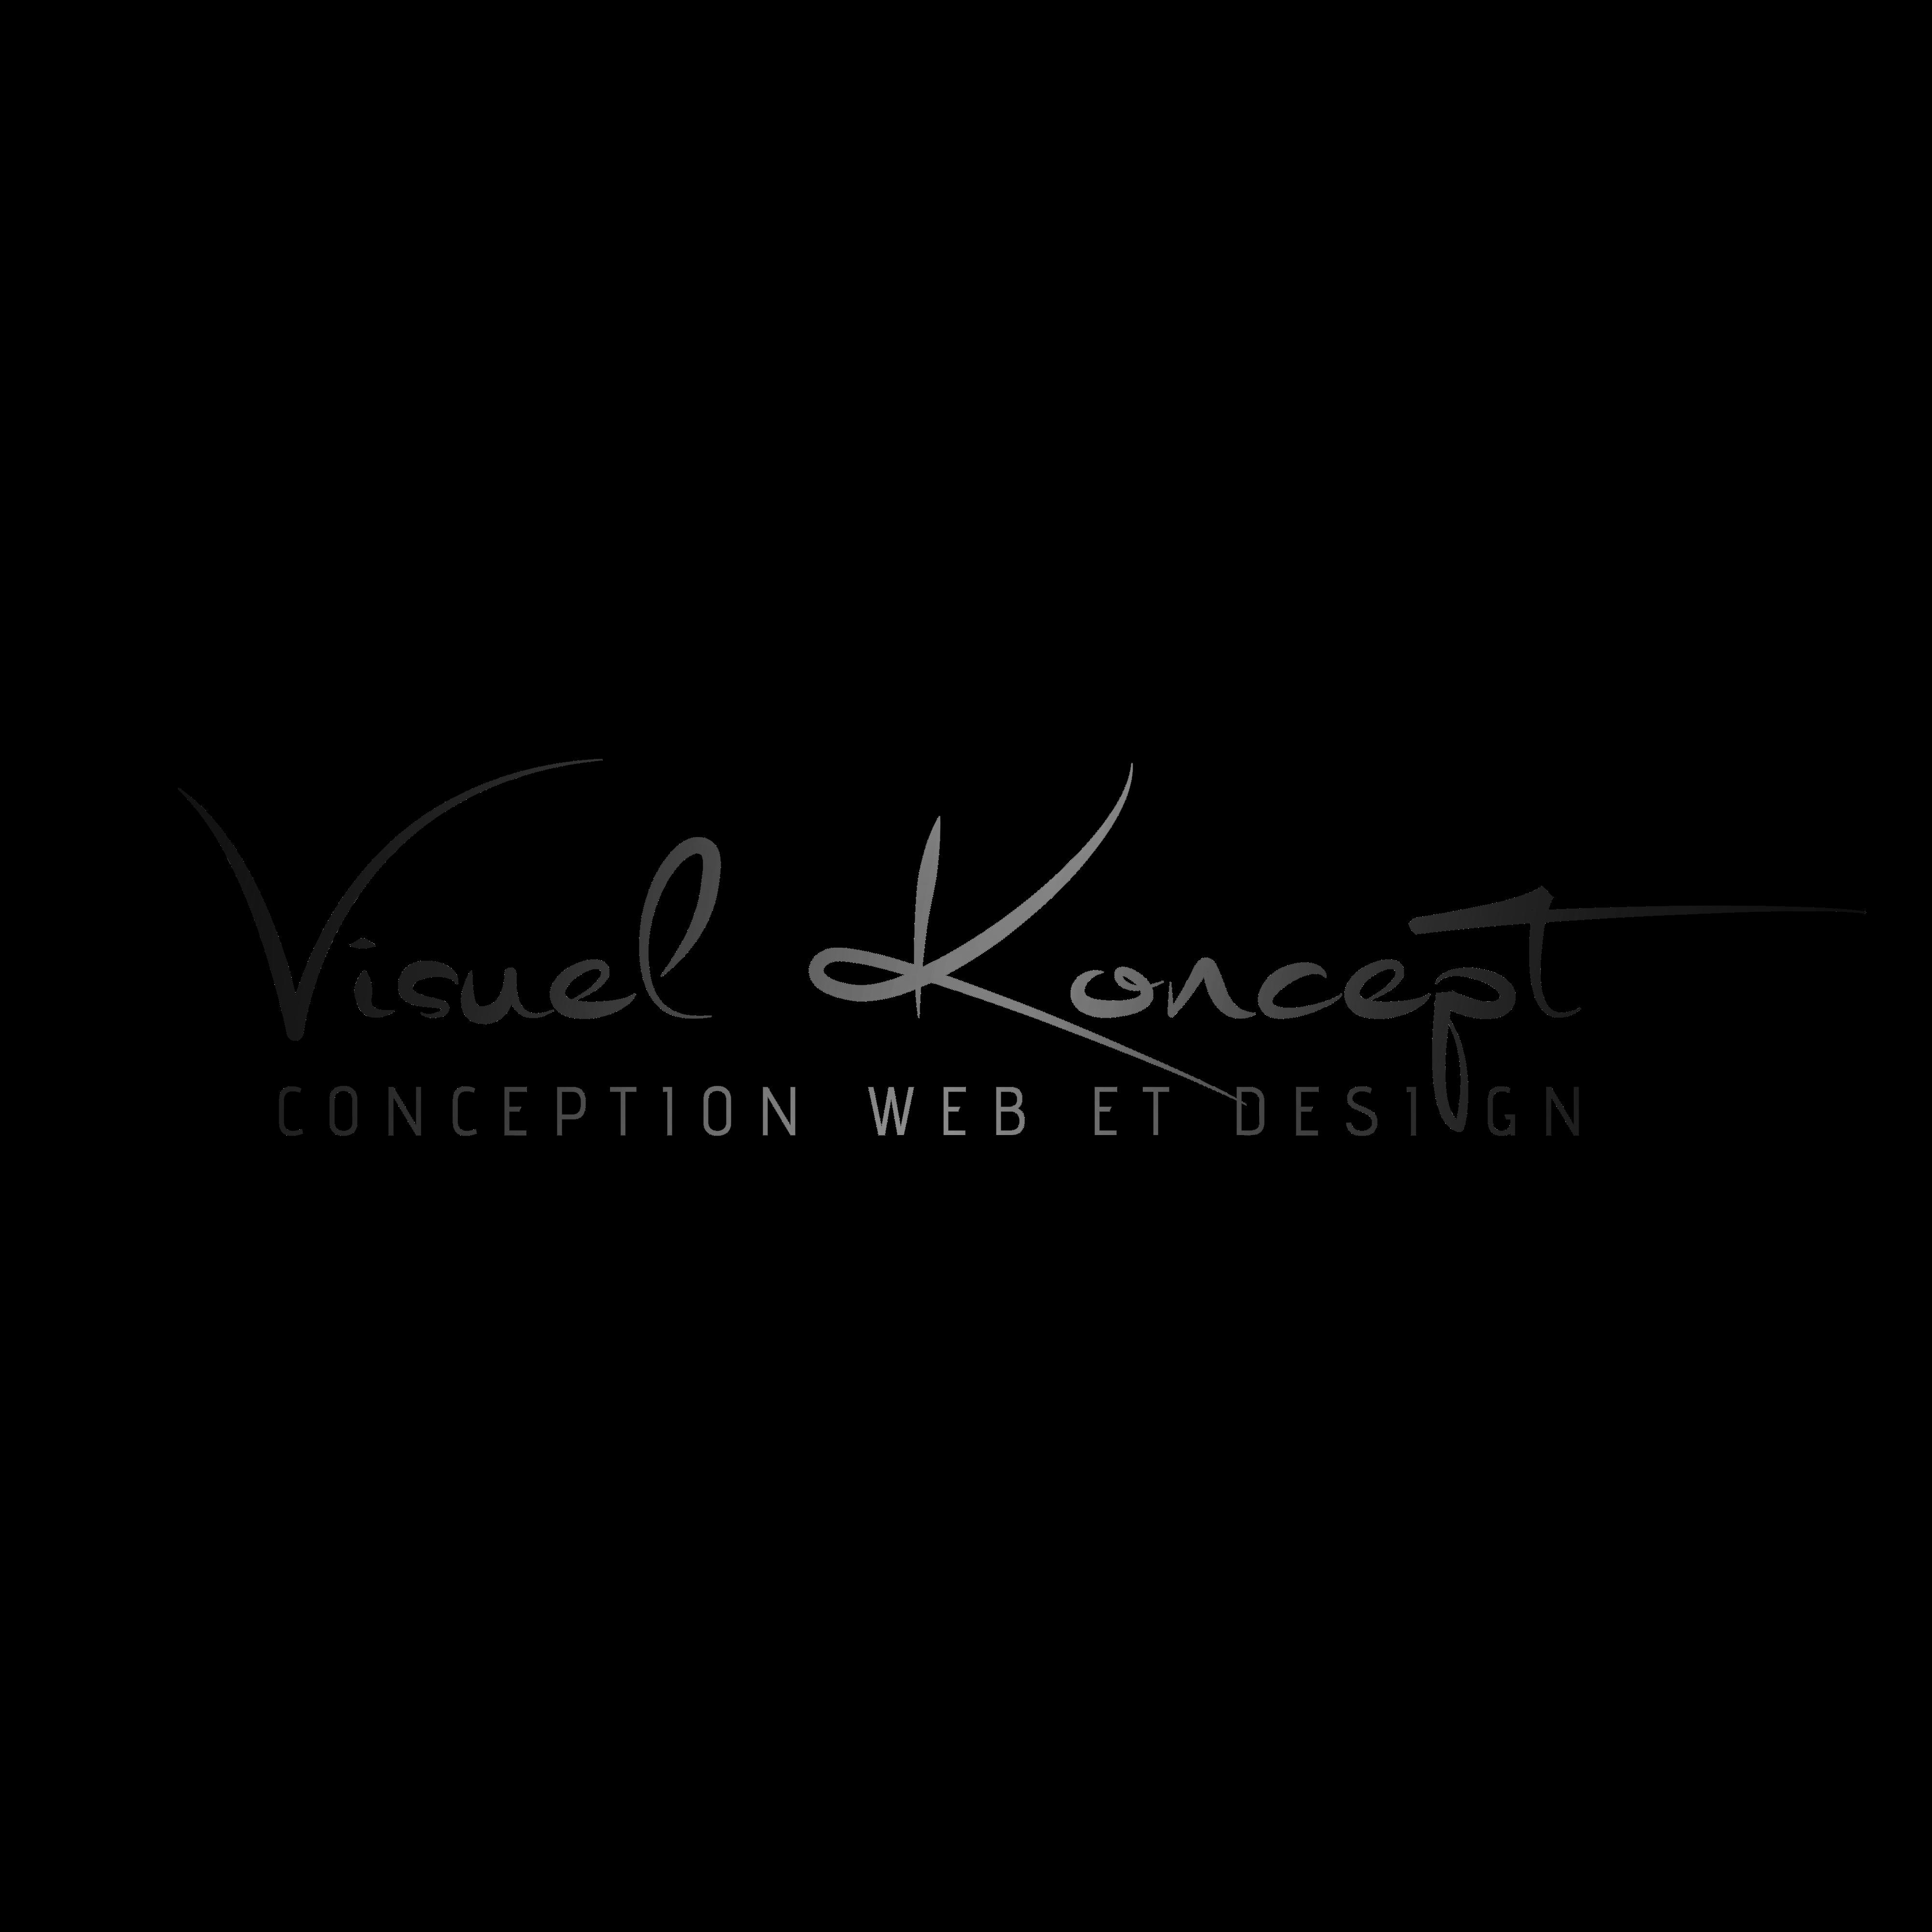 logo visuelkoncept